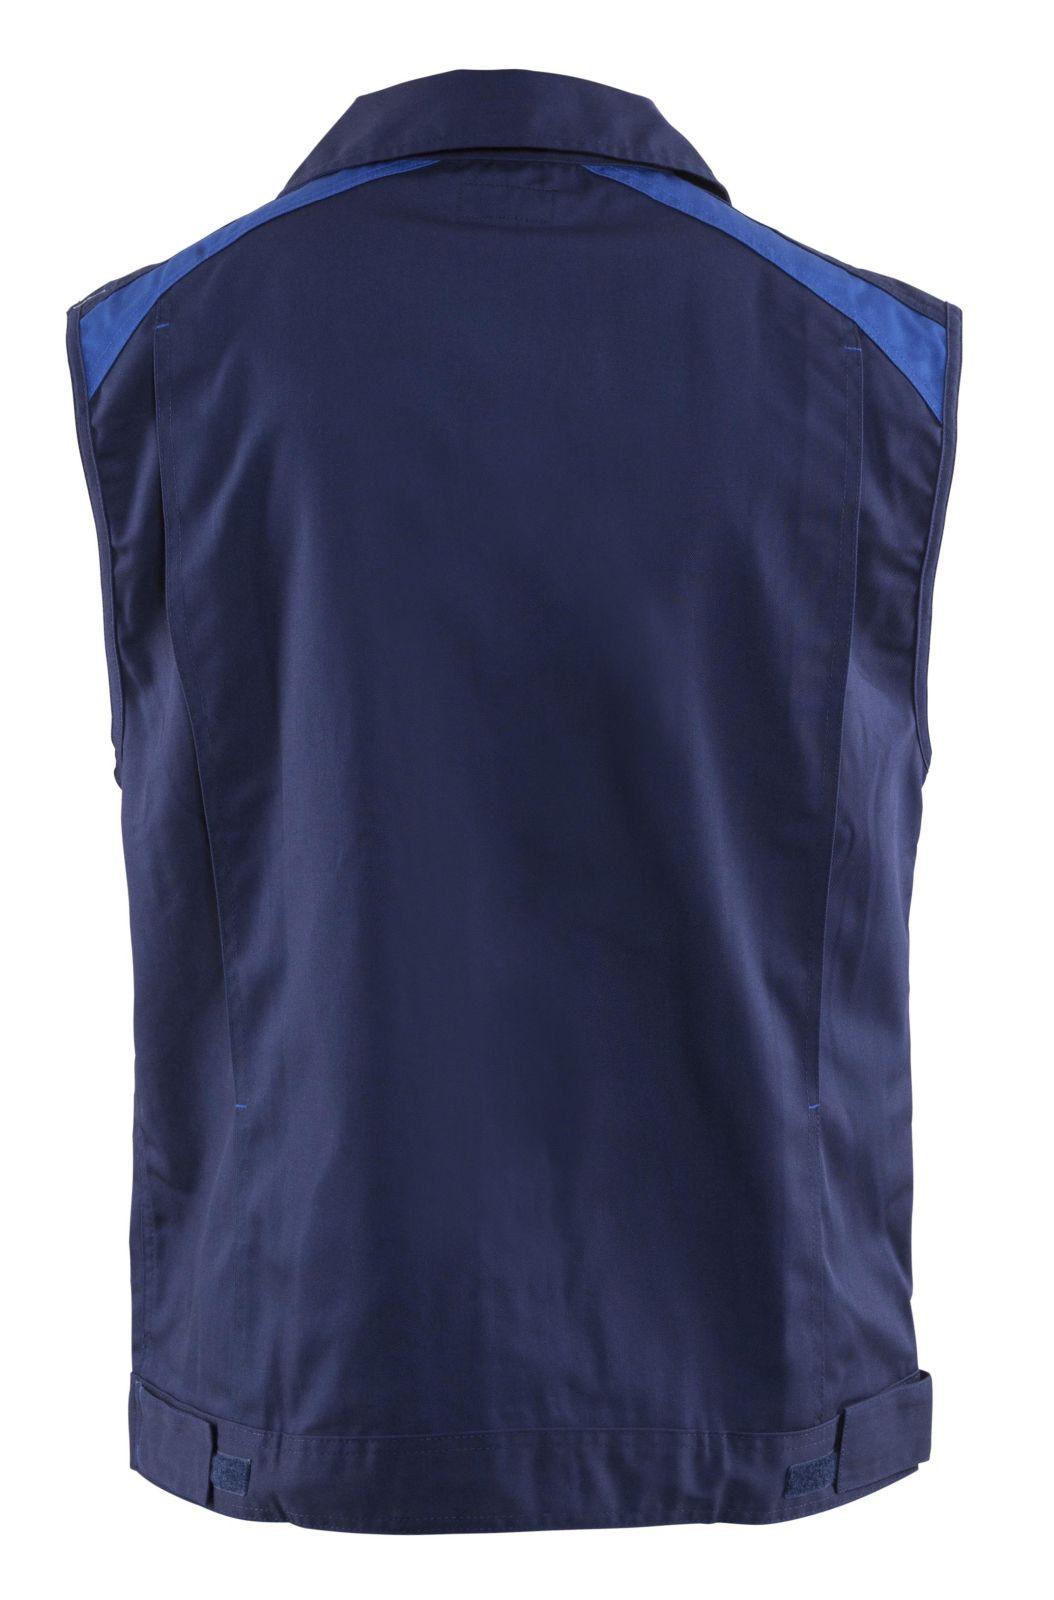 Blaklader Vesten 31641800 marineblauw-korenblauw(8985)